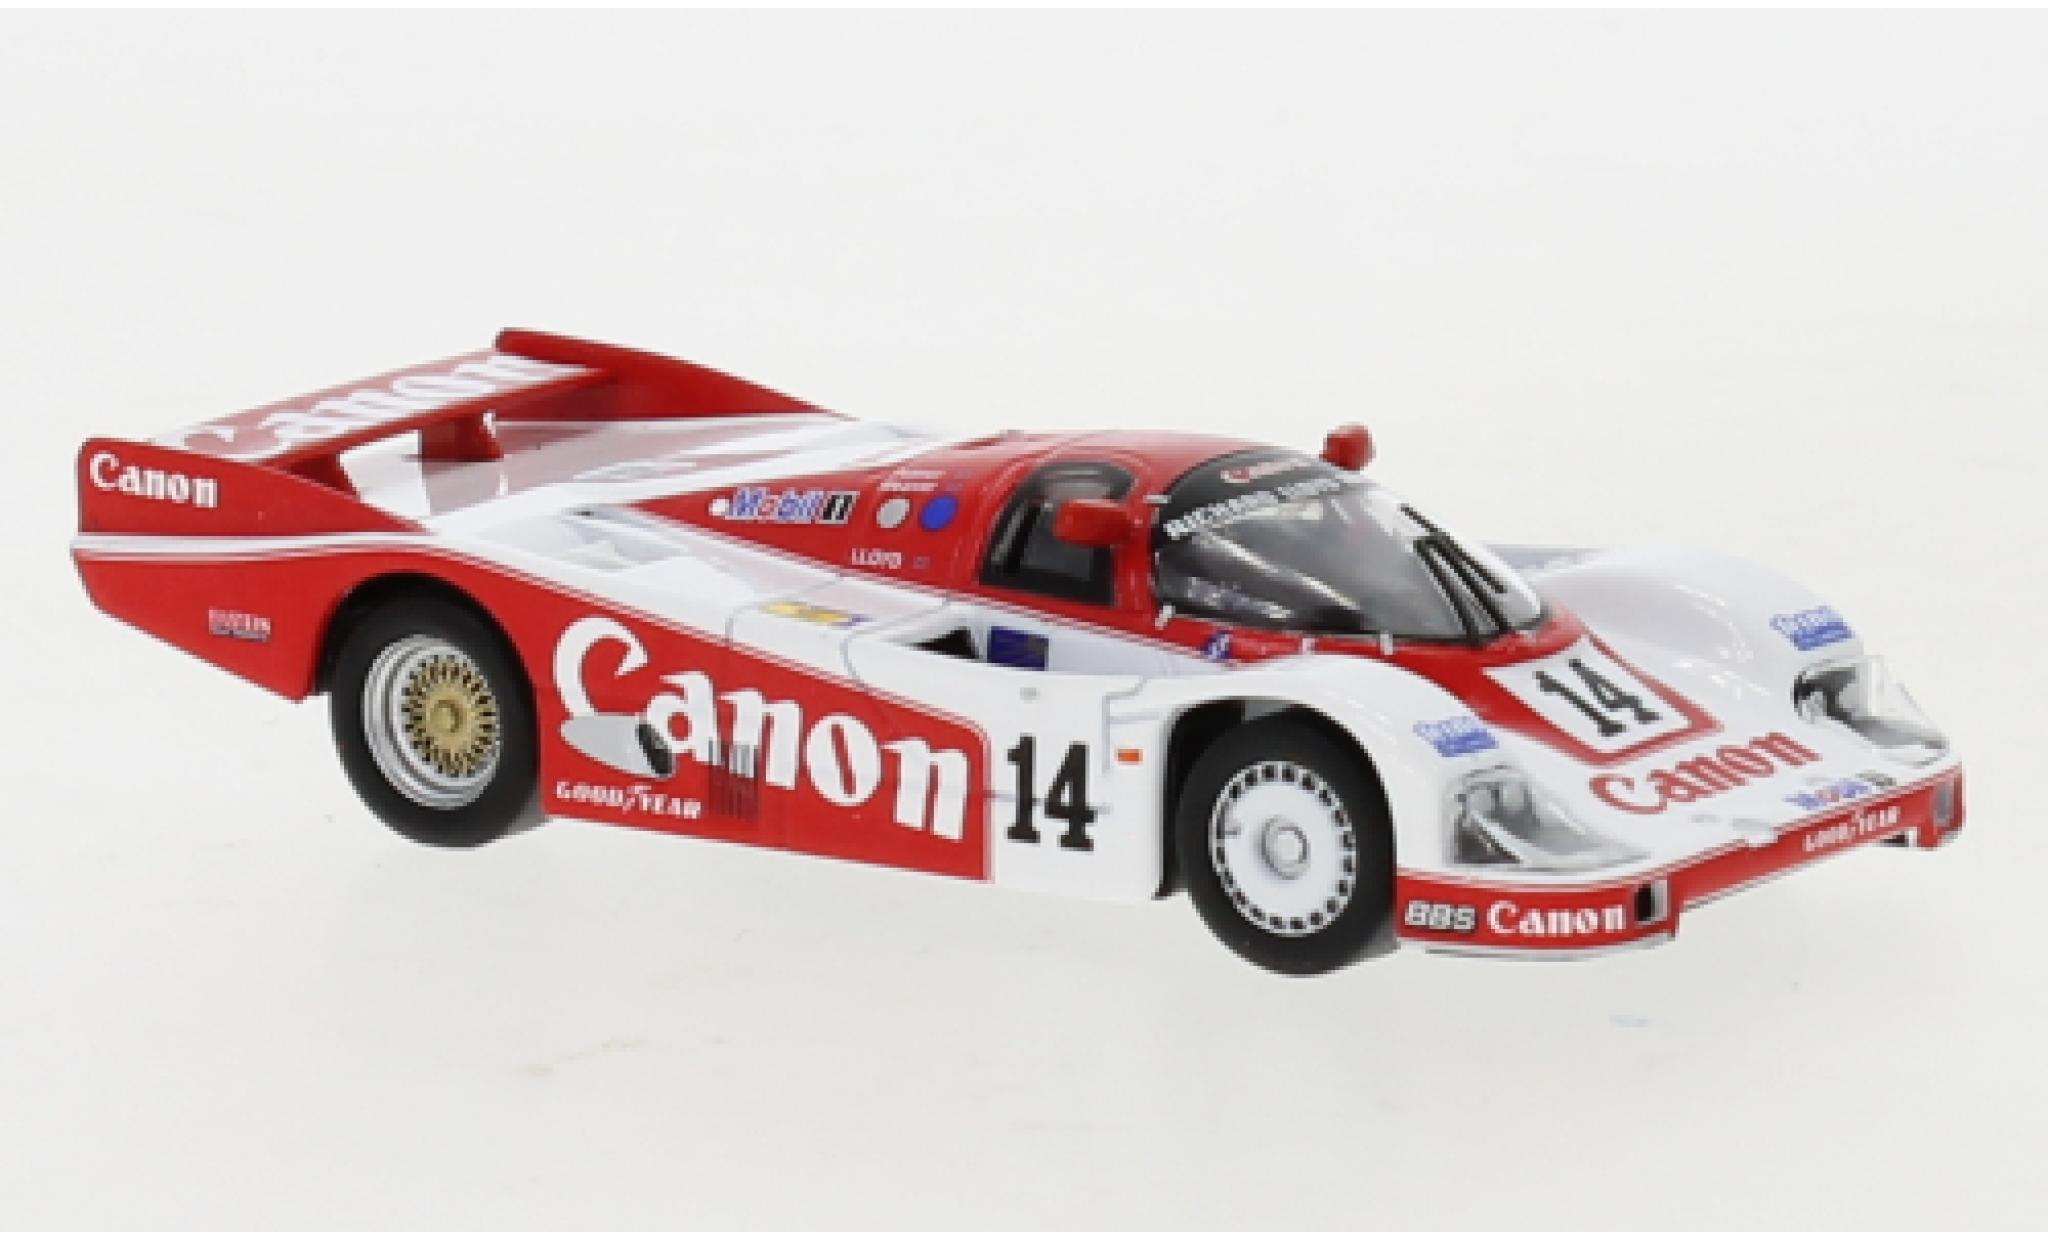 Porsche 956 1985 1/43 Spark RHD No.14 Richard Lloyd Racing Canon 24h Le Mans J.Palmer/J.Weaver/R.Lloyd